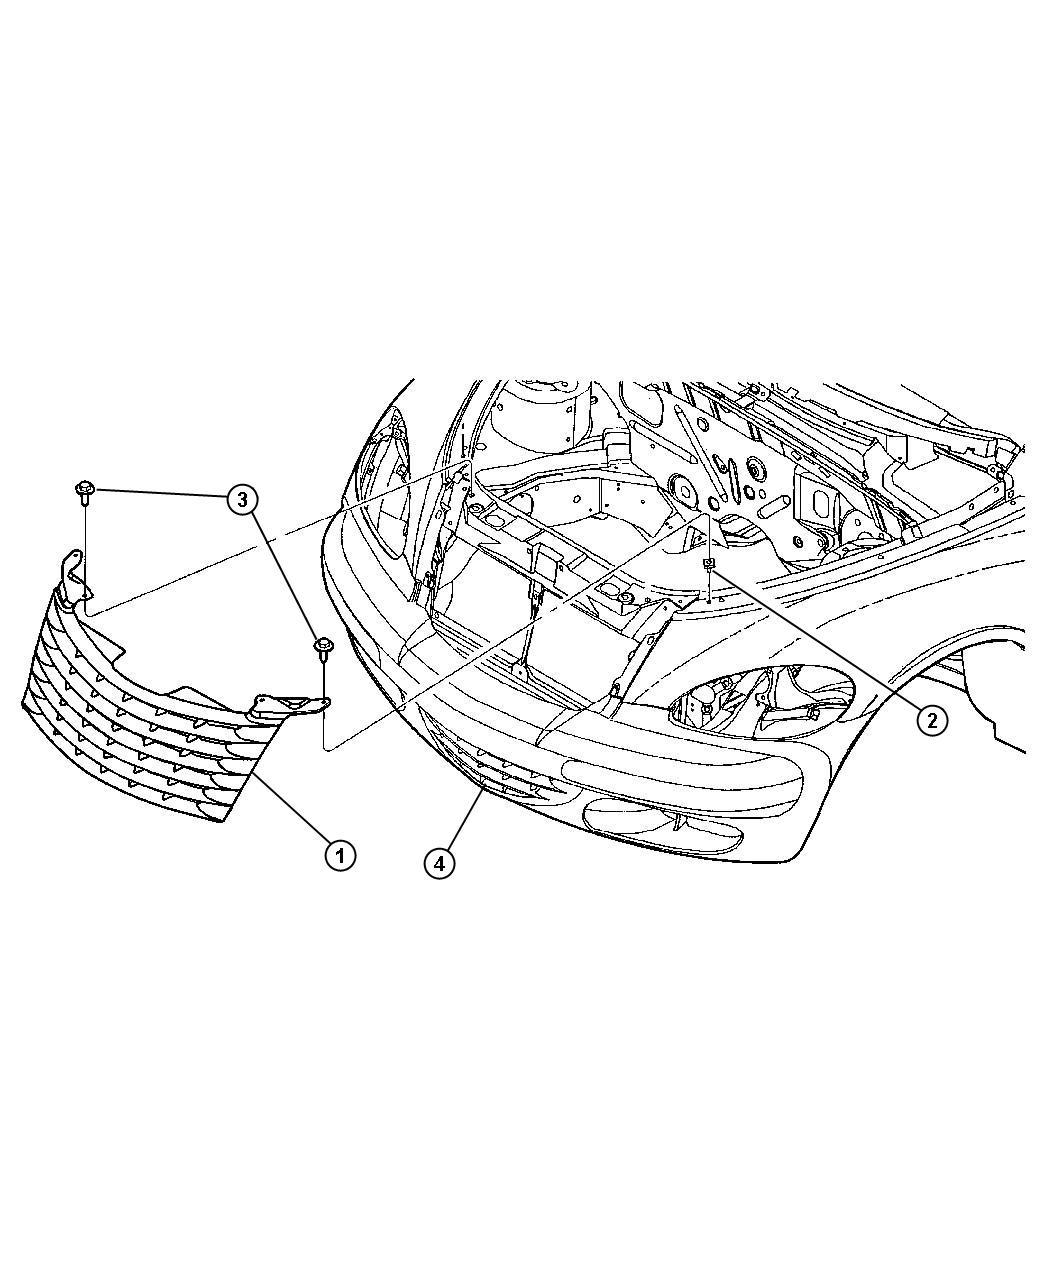 Chrysler Pt Cruiser Grille Lower Cooling Front